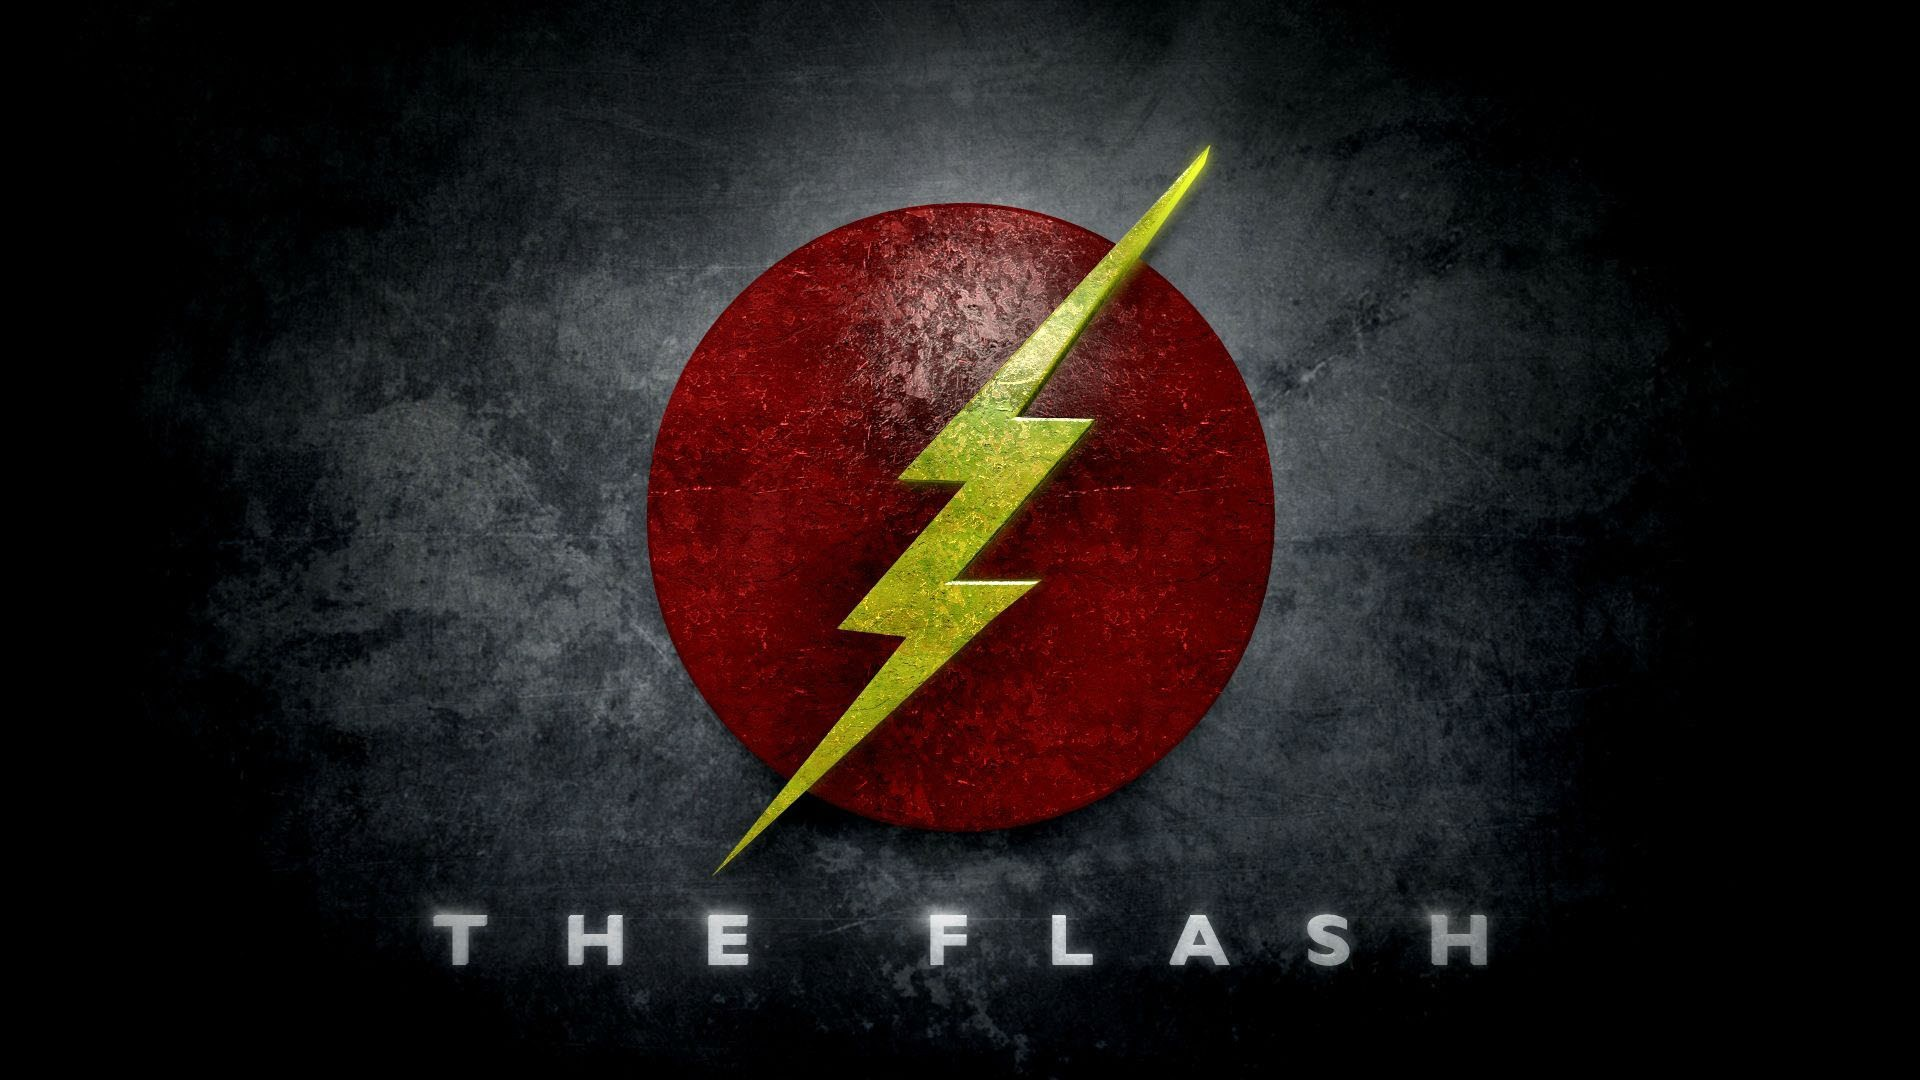 … Amazing 4K Wallpaper The Flash Logo Wallpaper in 9 The Flash Logo HD  Wallpapers Free Download